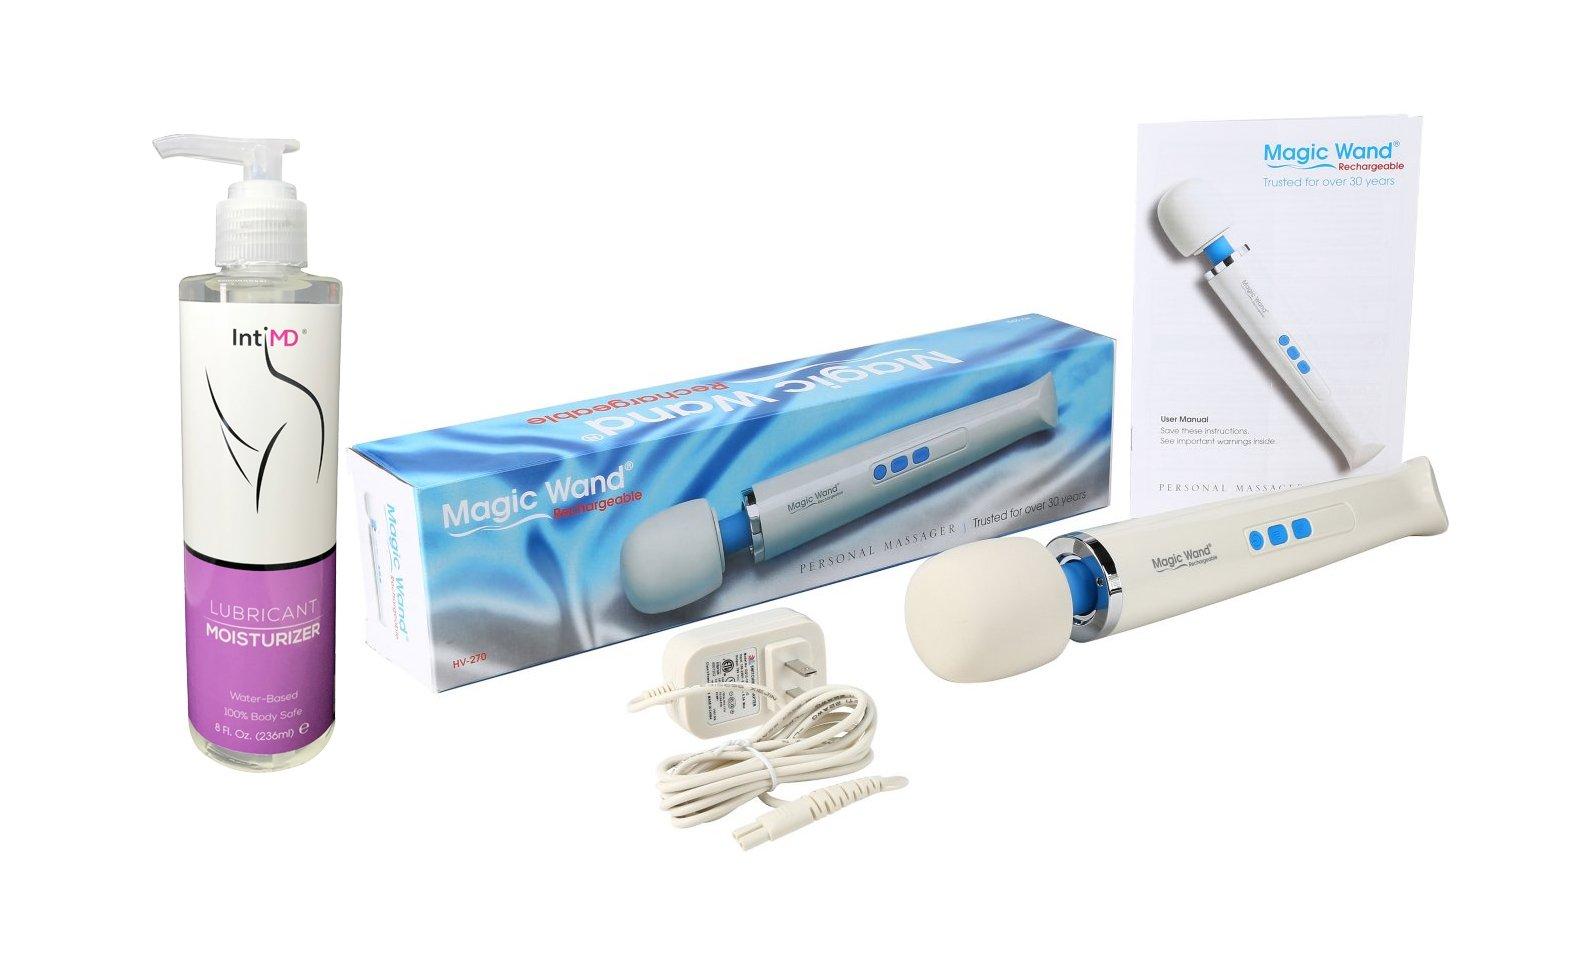 Magic Wand Rechargeable Cordless VIVA Kit Therapeutic Wand Massager Includes IntiMD Massaging Moisturizer 8oz